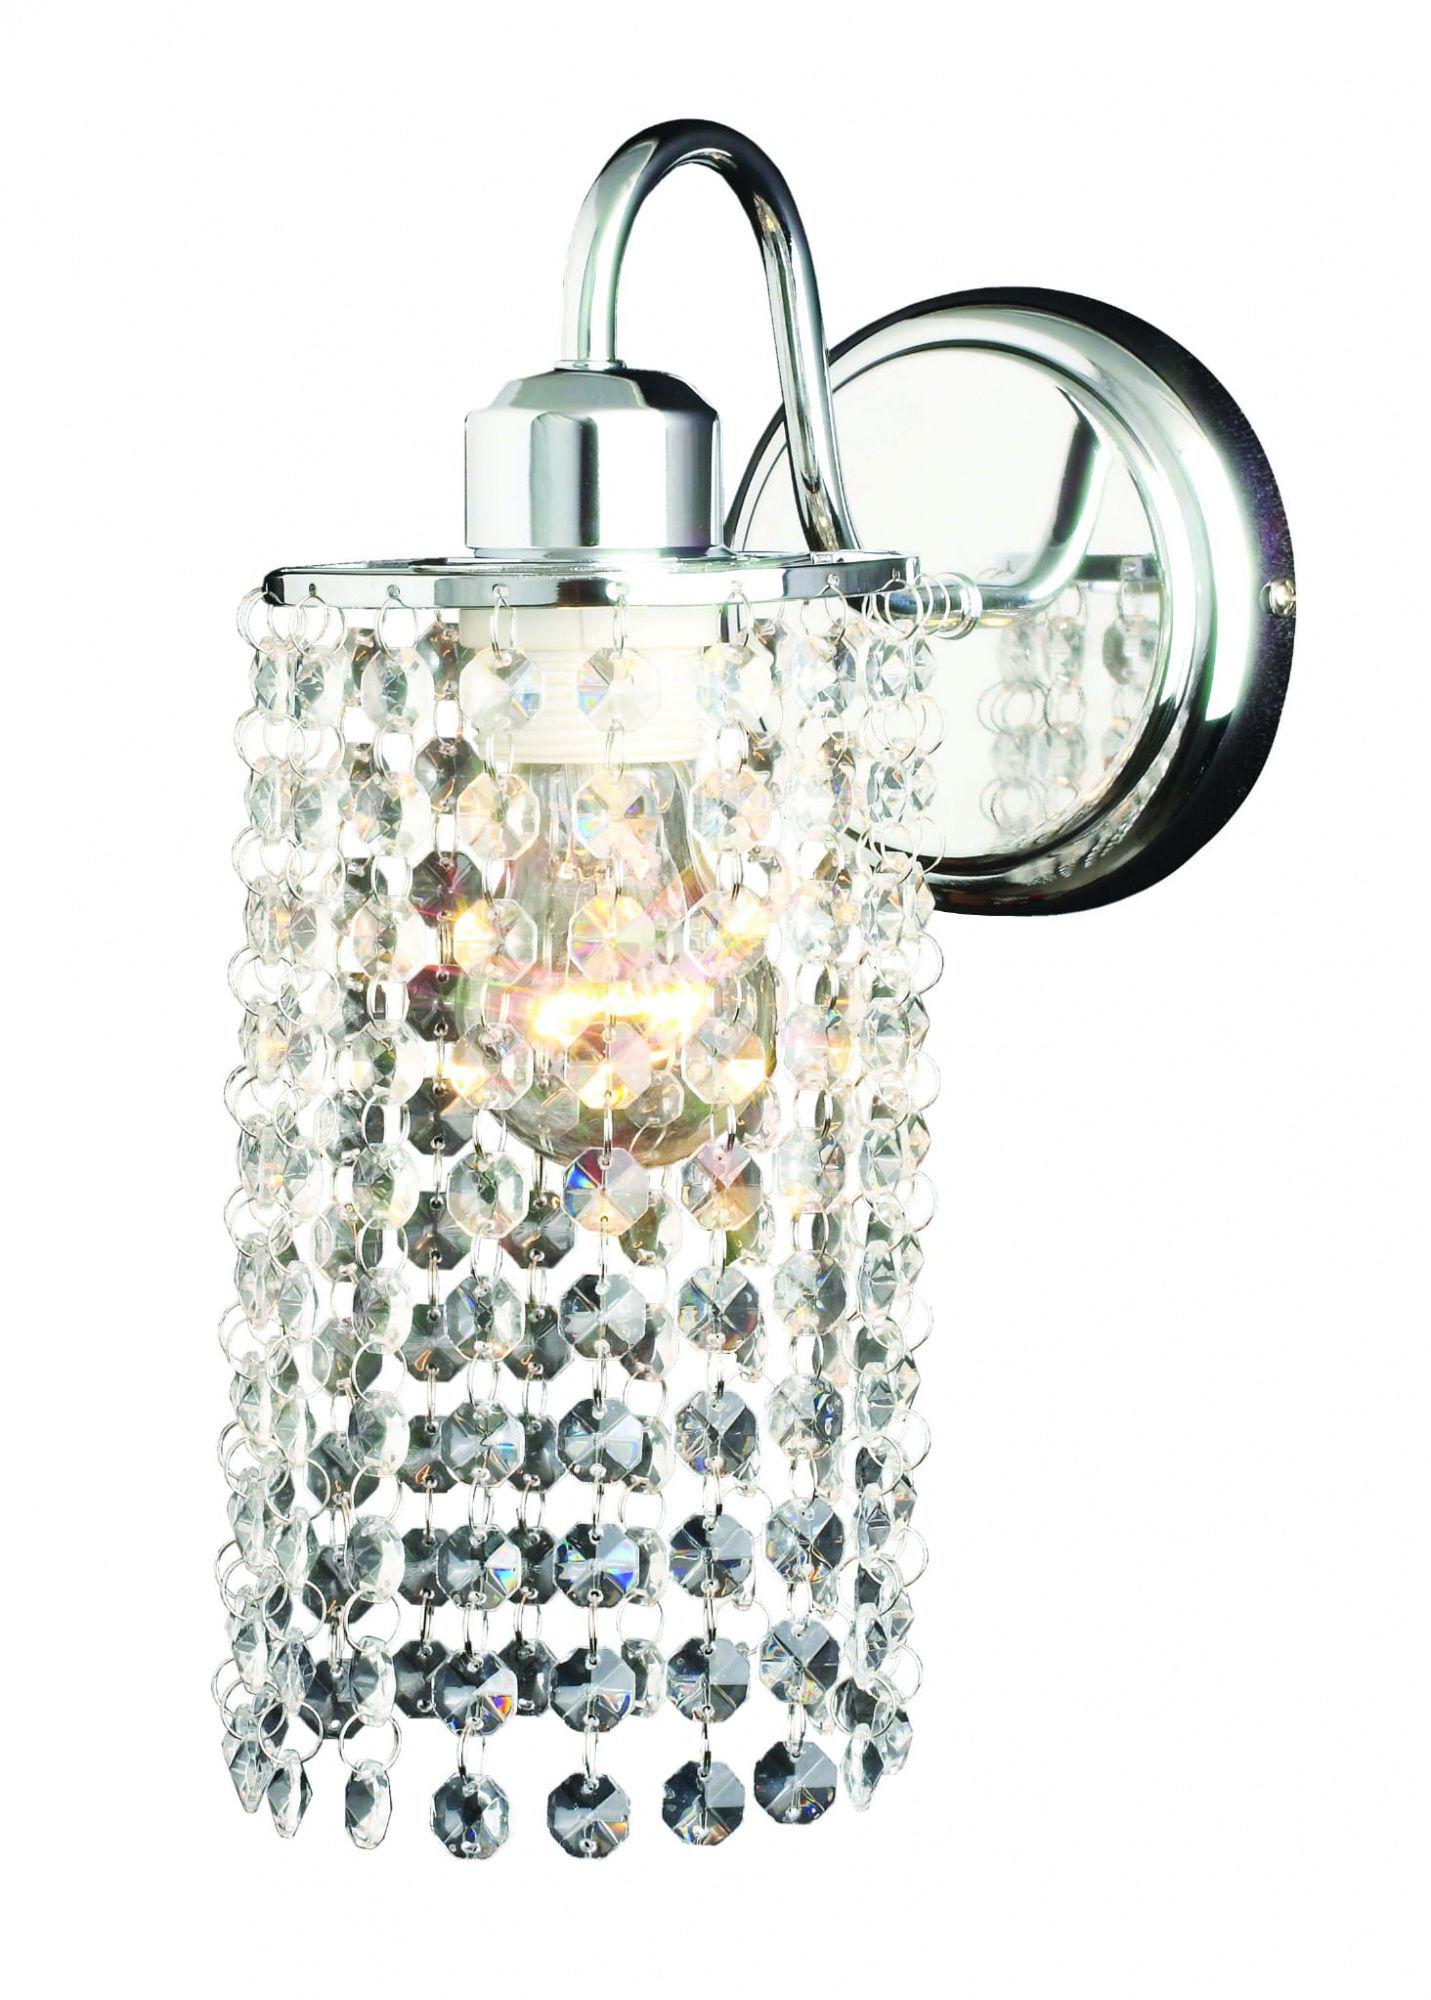 Kinkiet Bright Star LP-812/1W Light Prestige kryształowa lampa ścienna w kolorze srebrnym